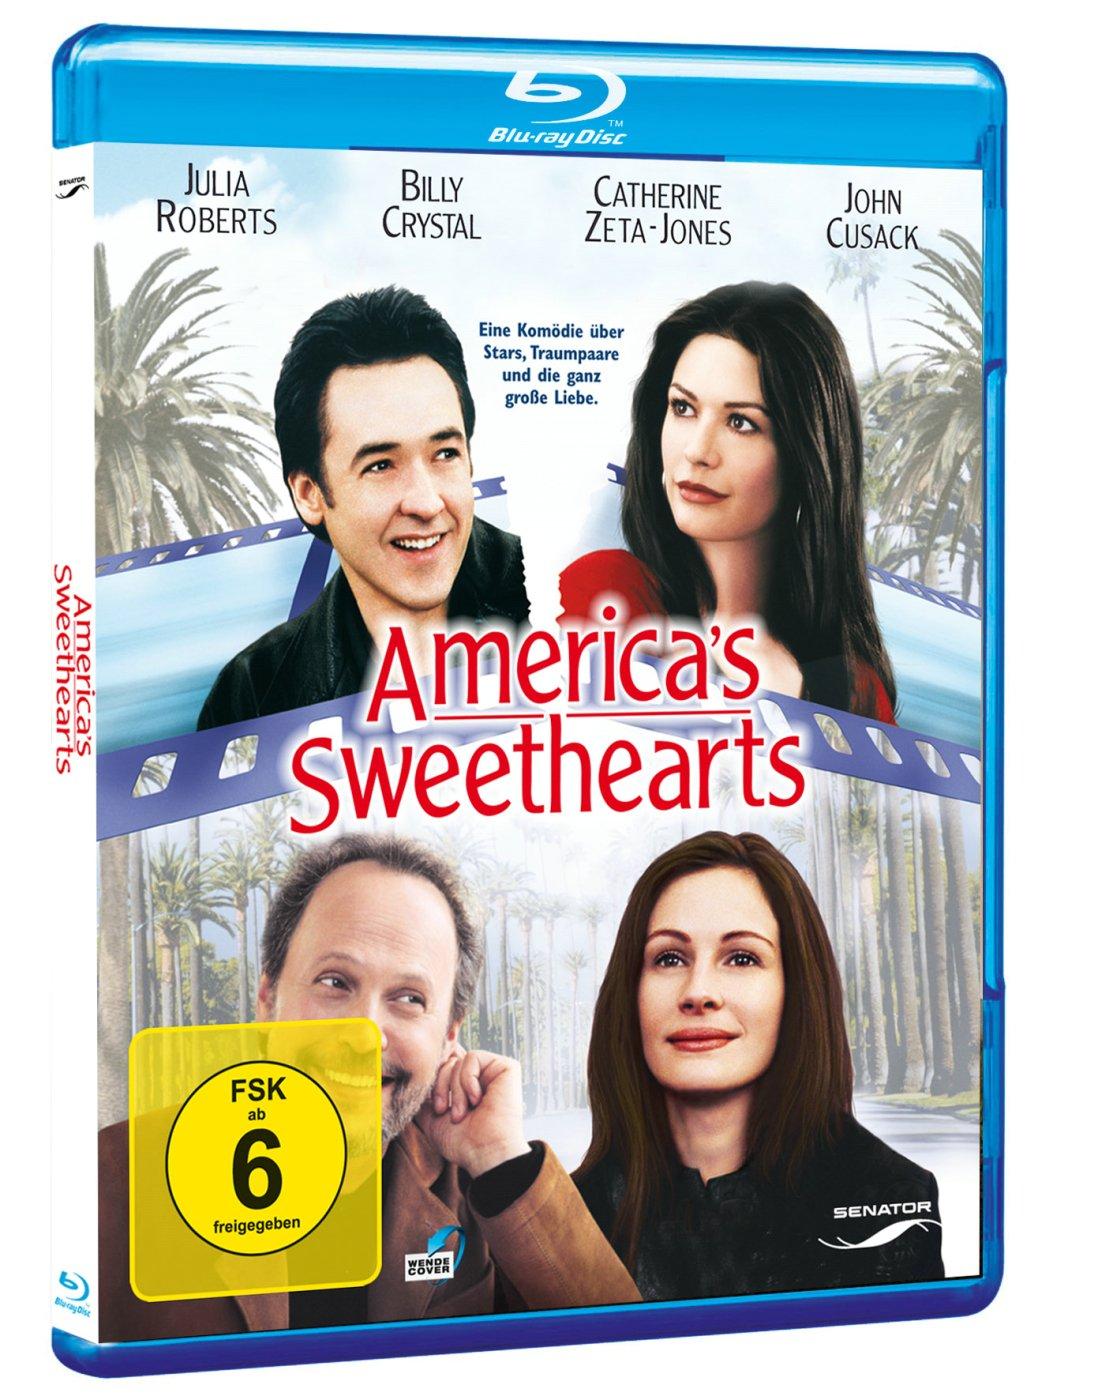 America's Sweethearts [Blu-ray] nur 8,97 staff 15,31€